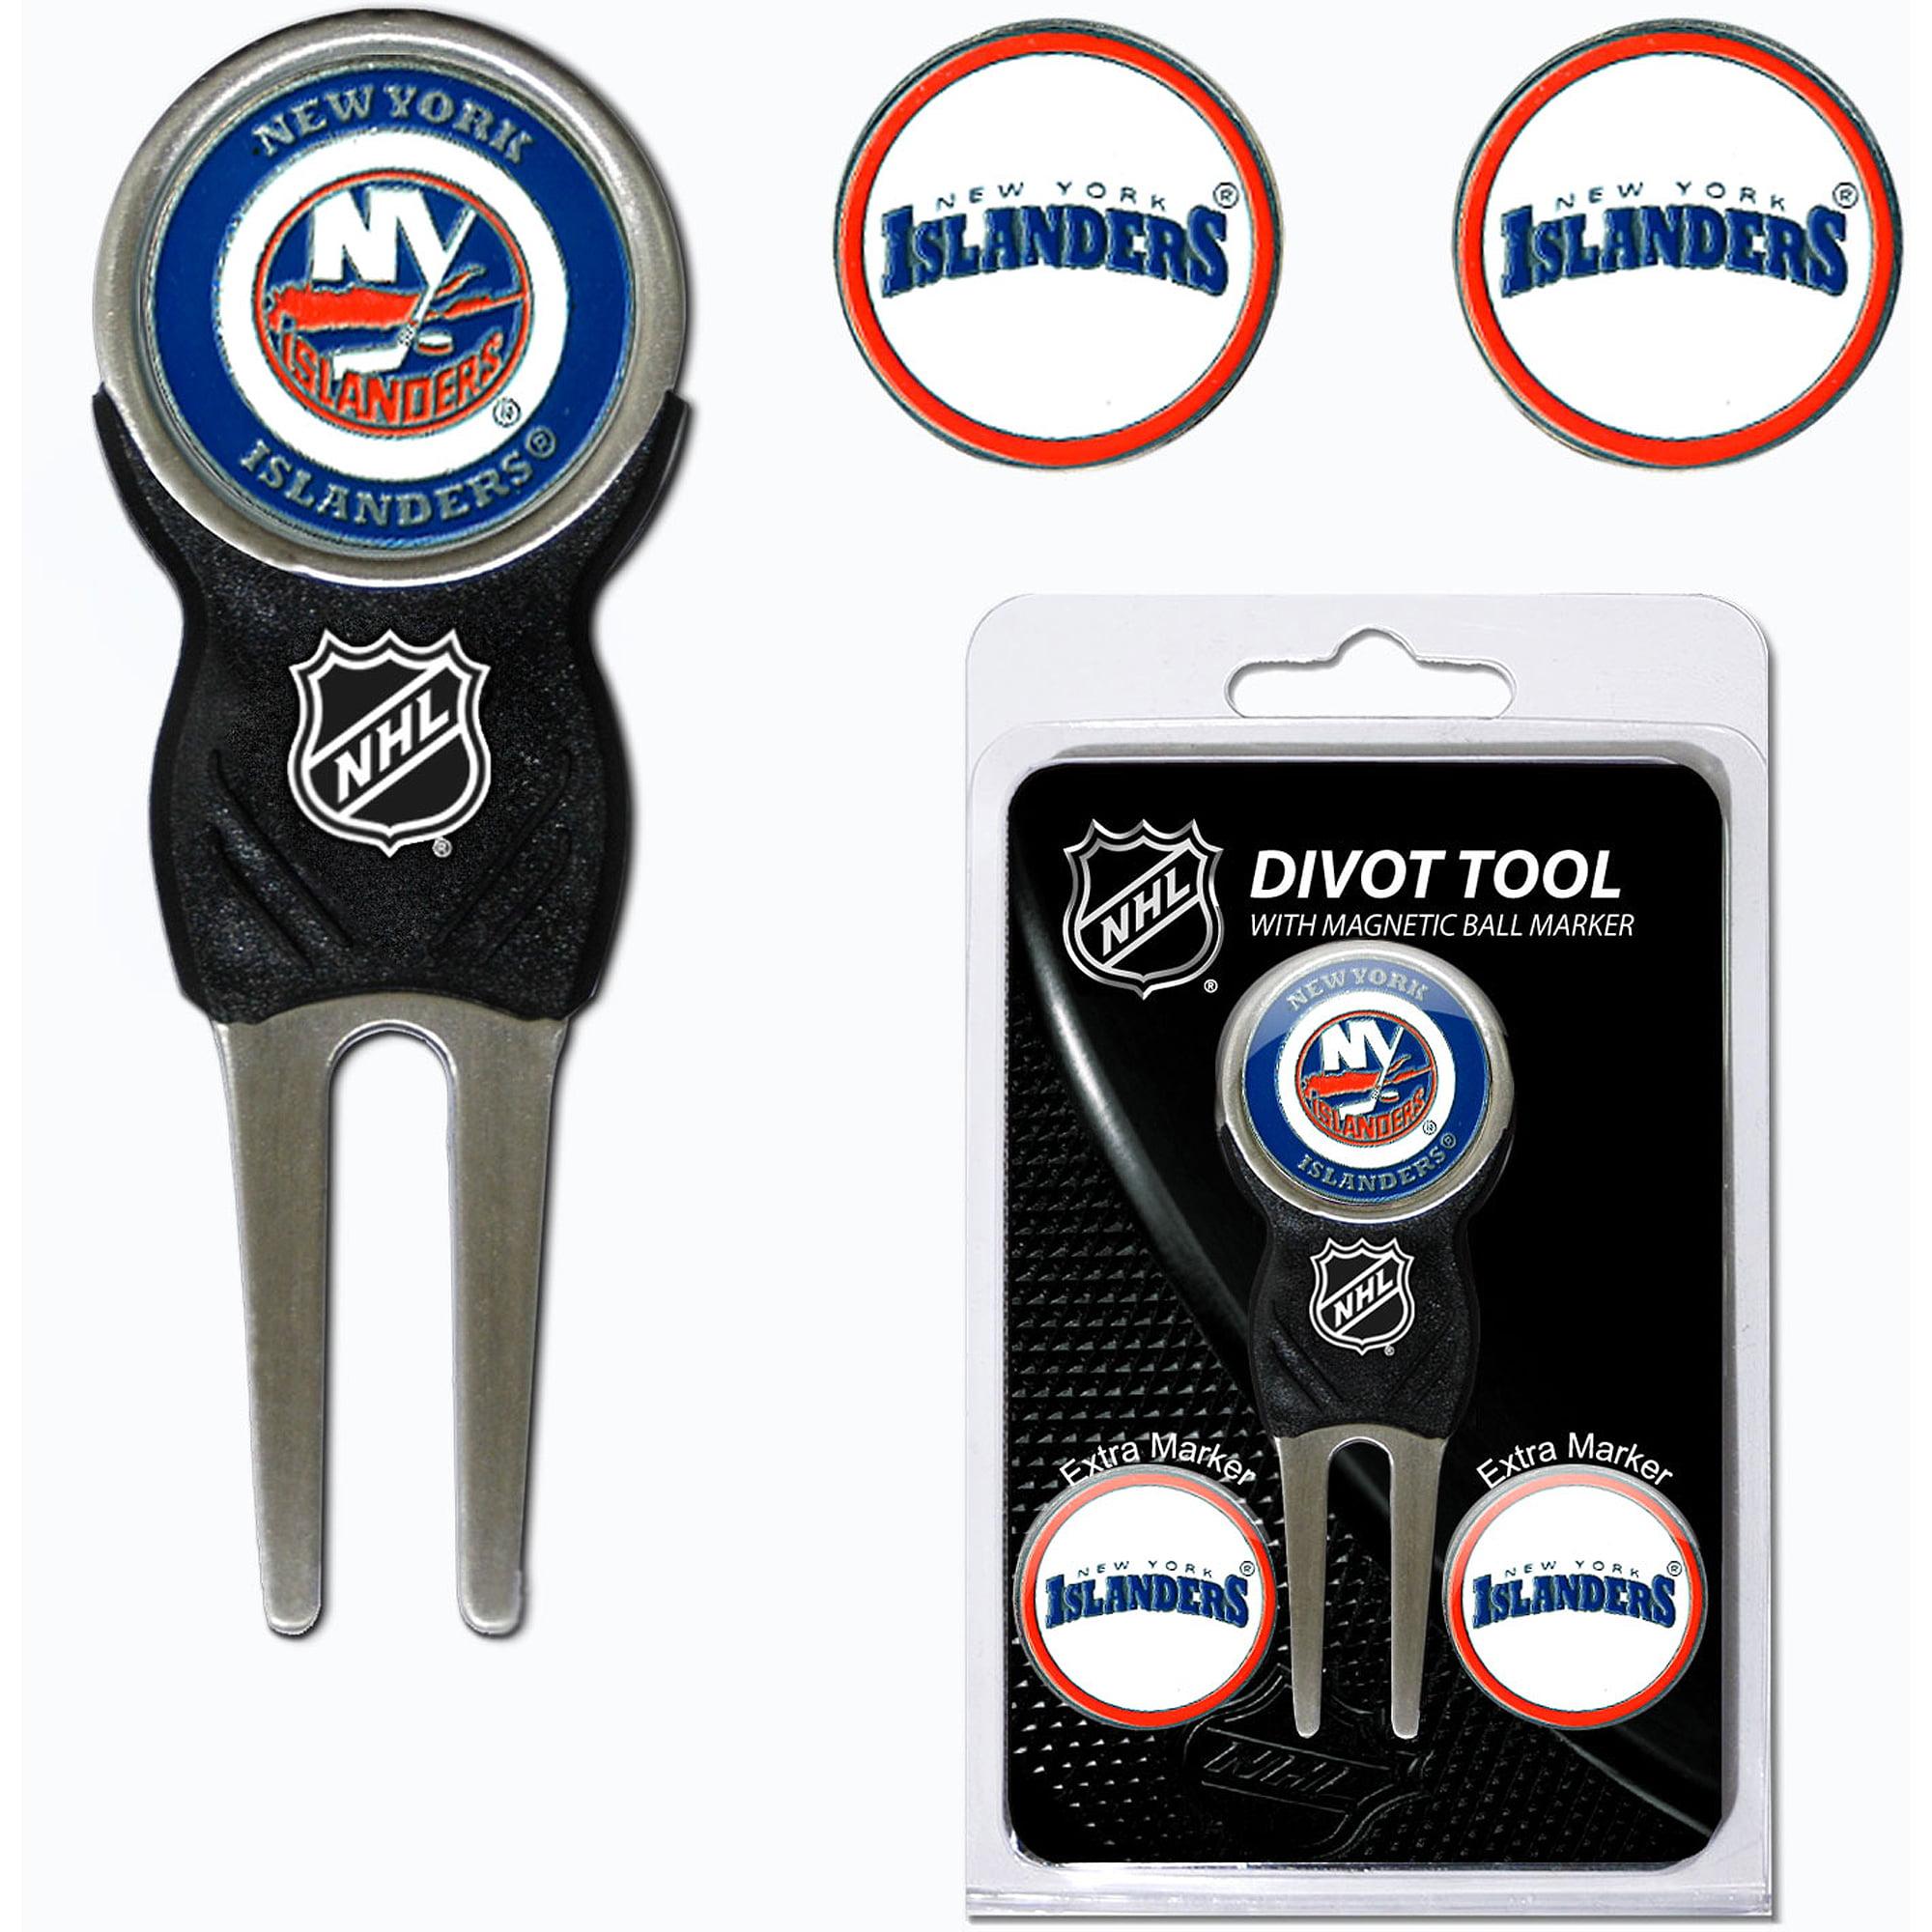 New York Islanders 3-Marker Signature Divot Tool Pack